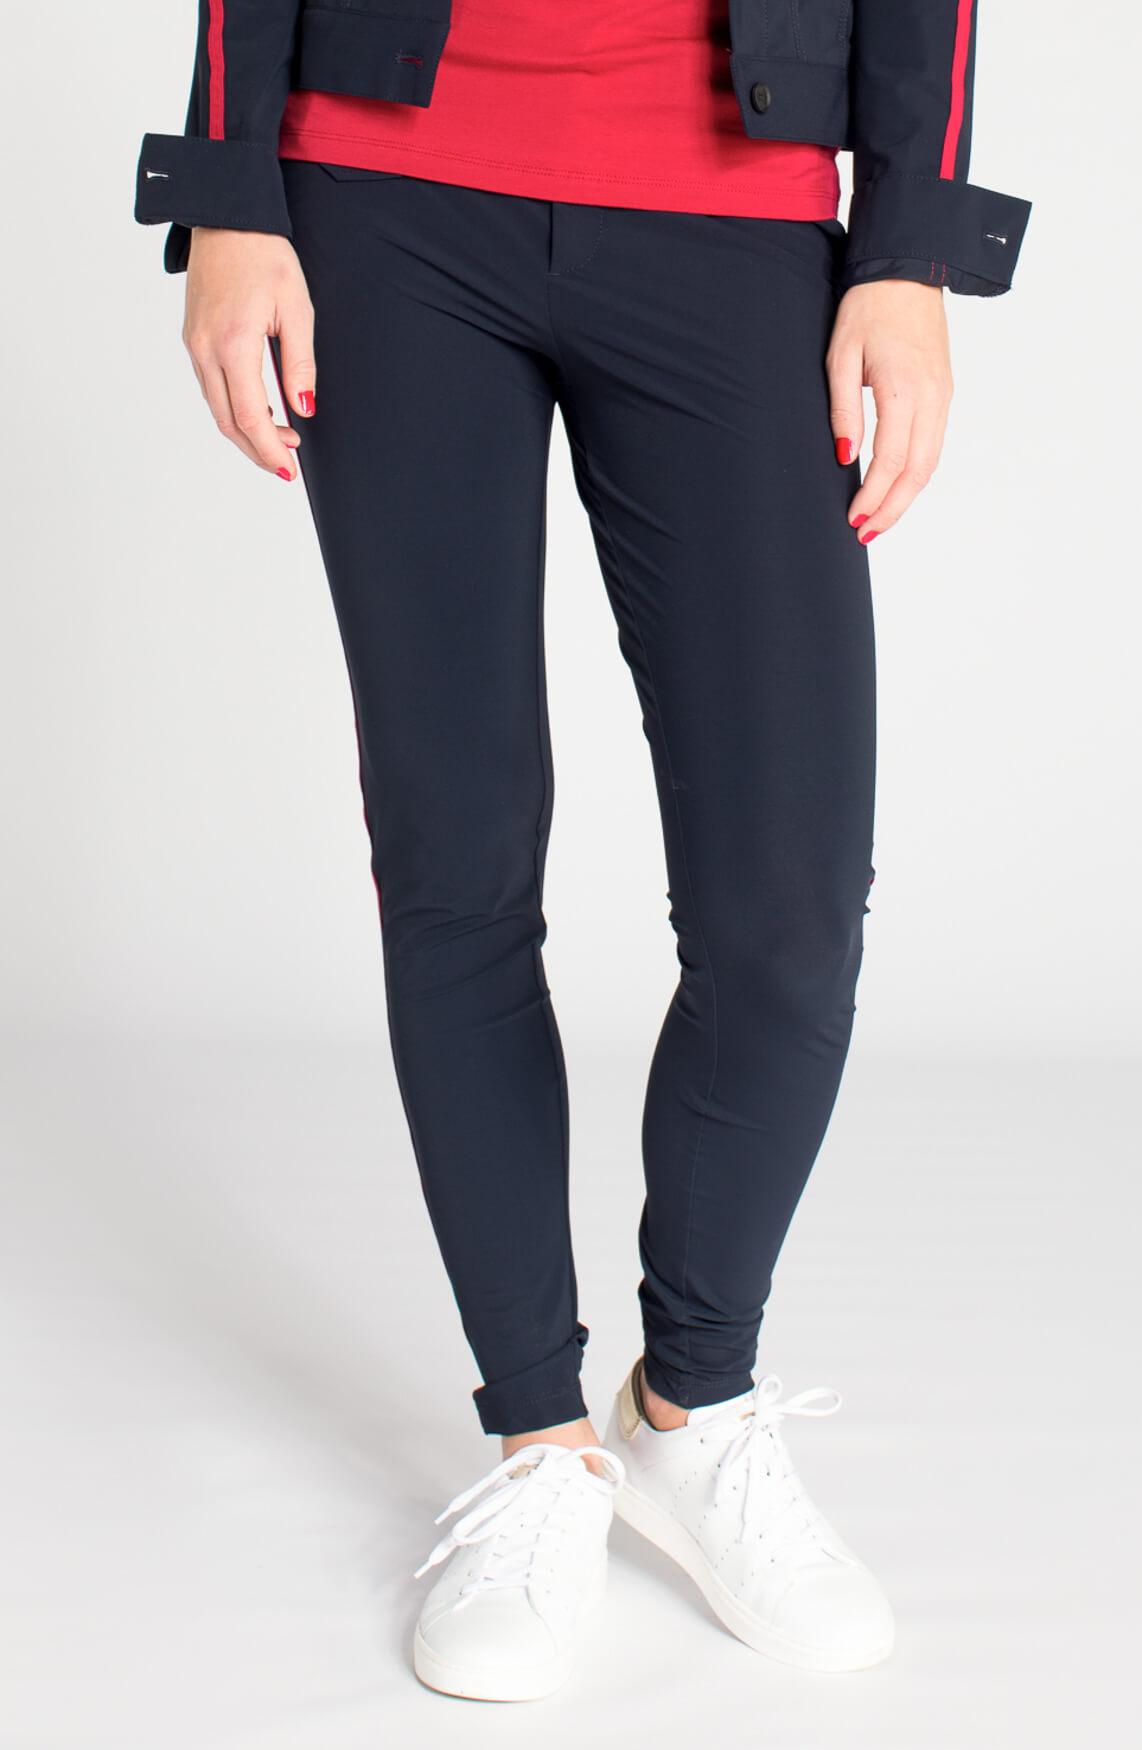 Penn & Ink Dames Sportieve pantalon marine